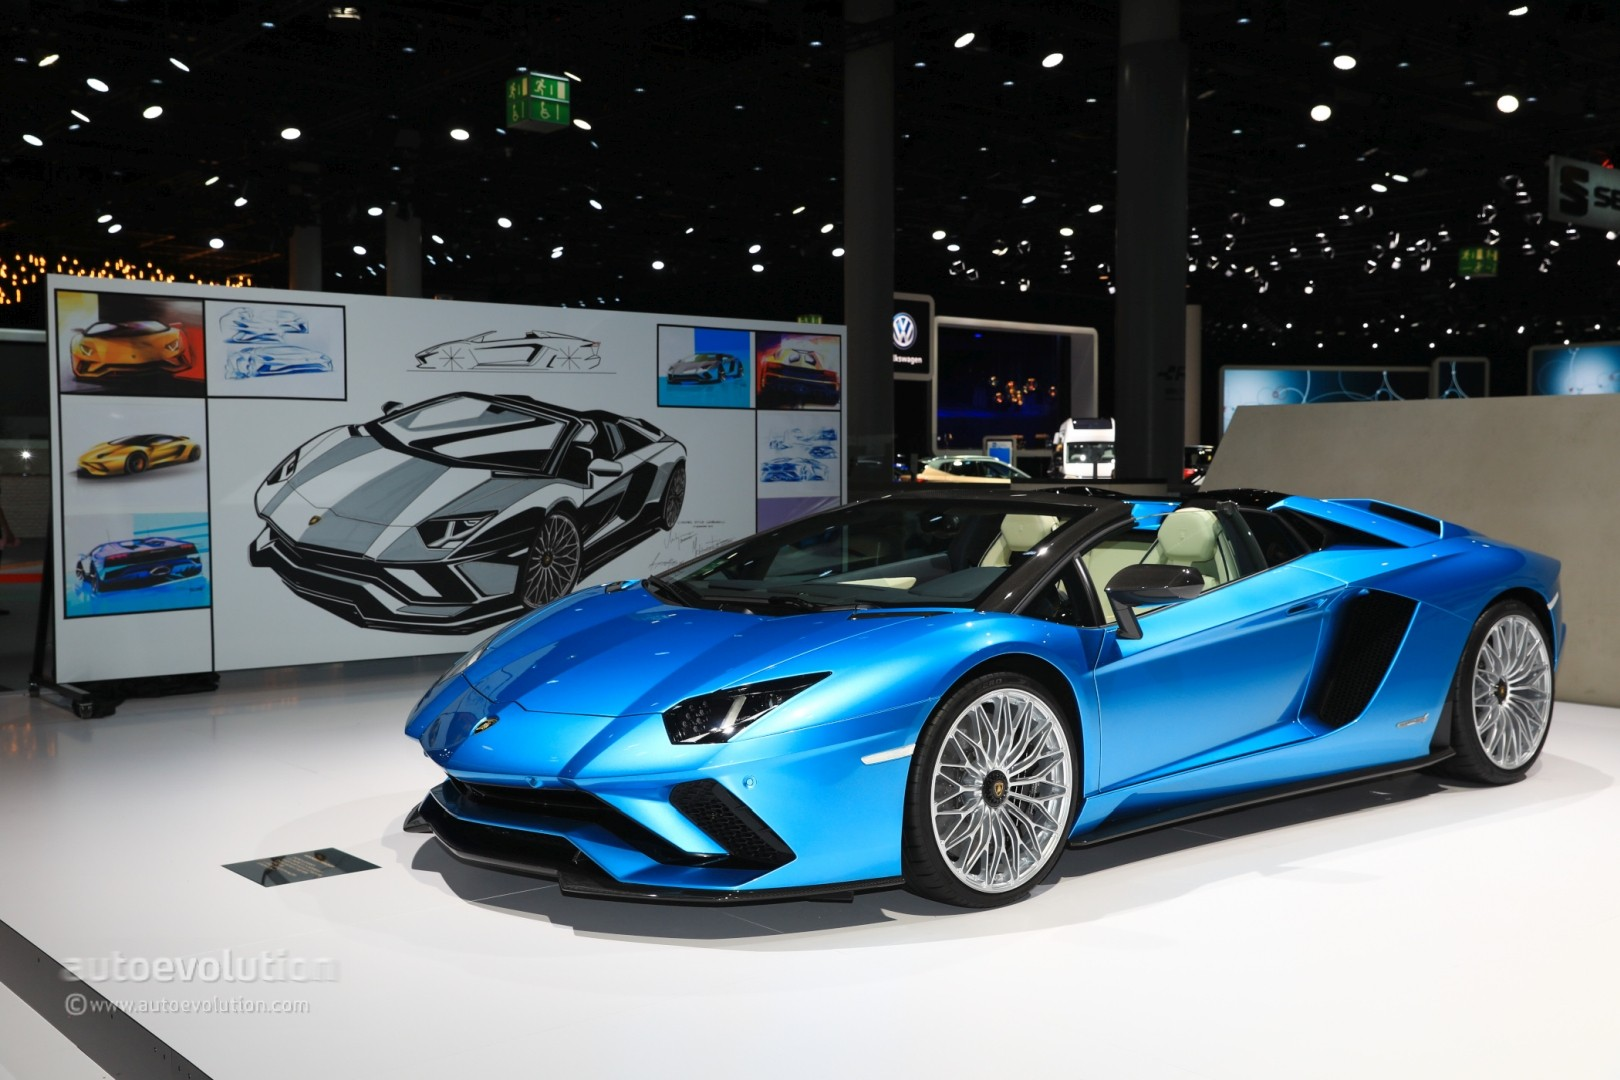 Lamborghini Aventador S Roadster Parades Blu Aegir Color In Frankfurt Autoevolution